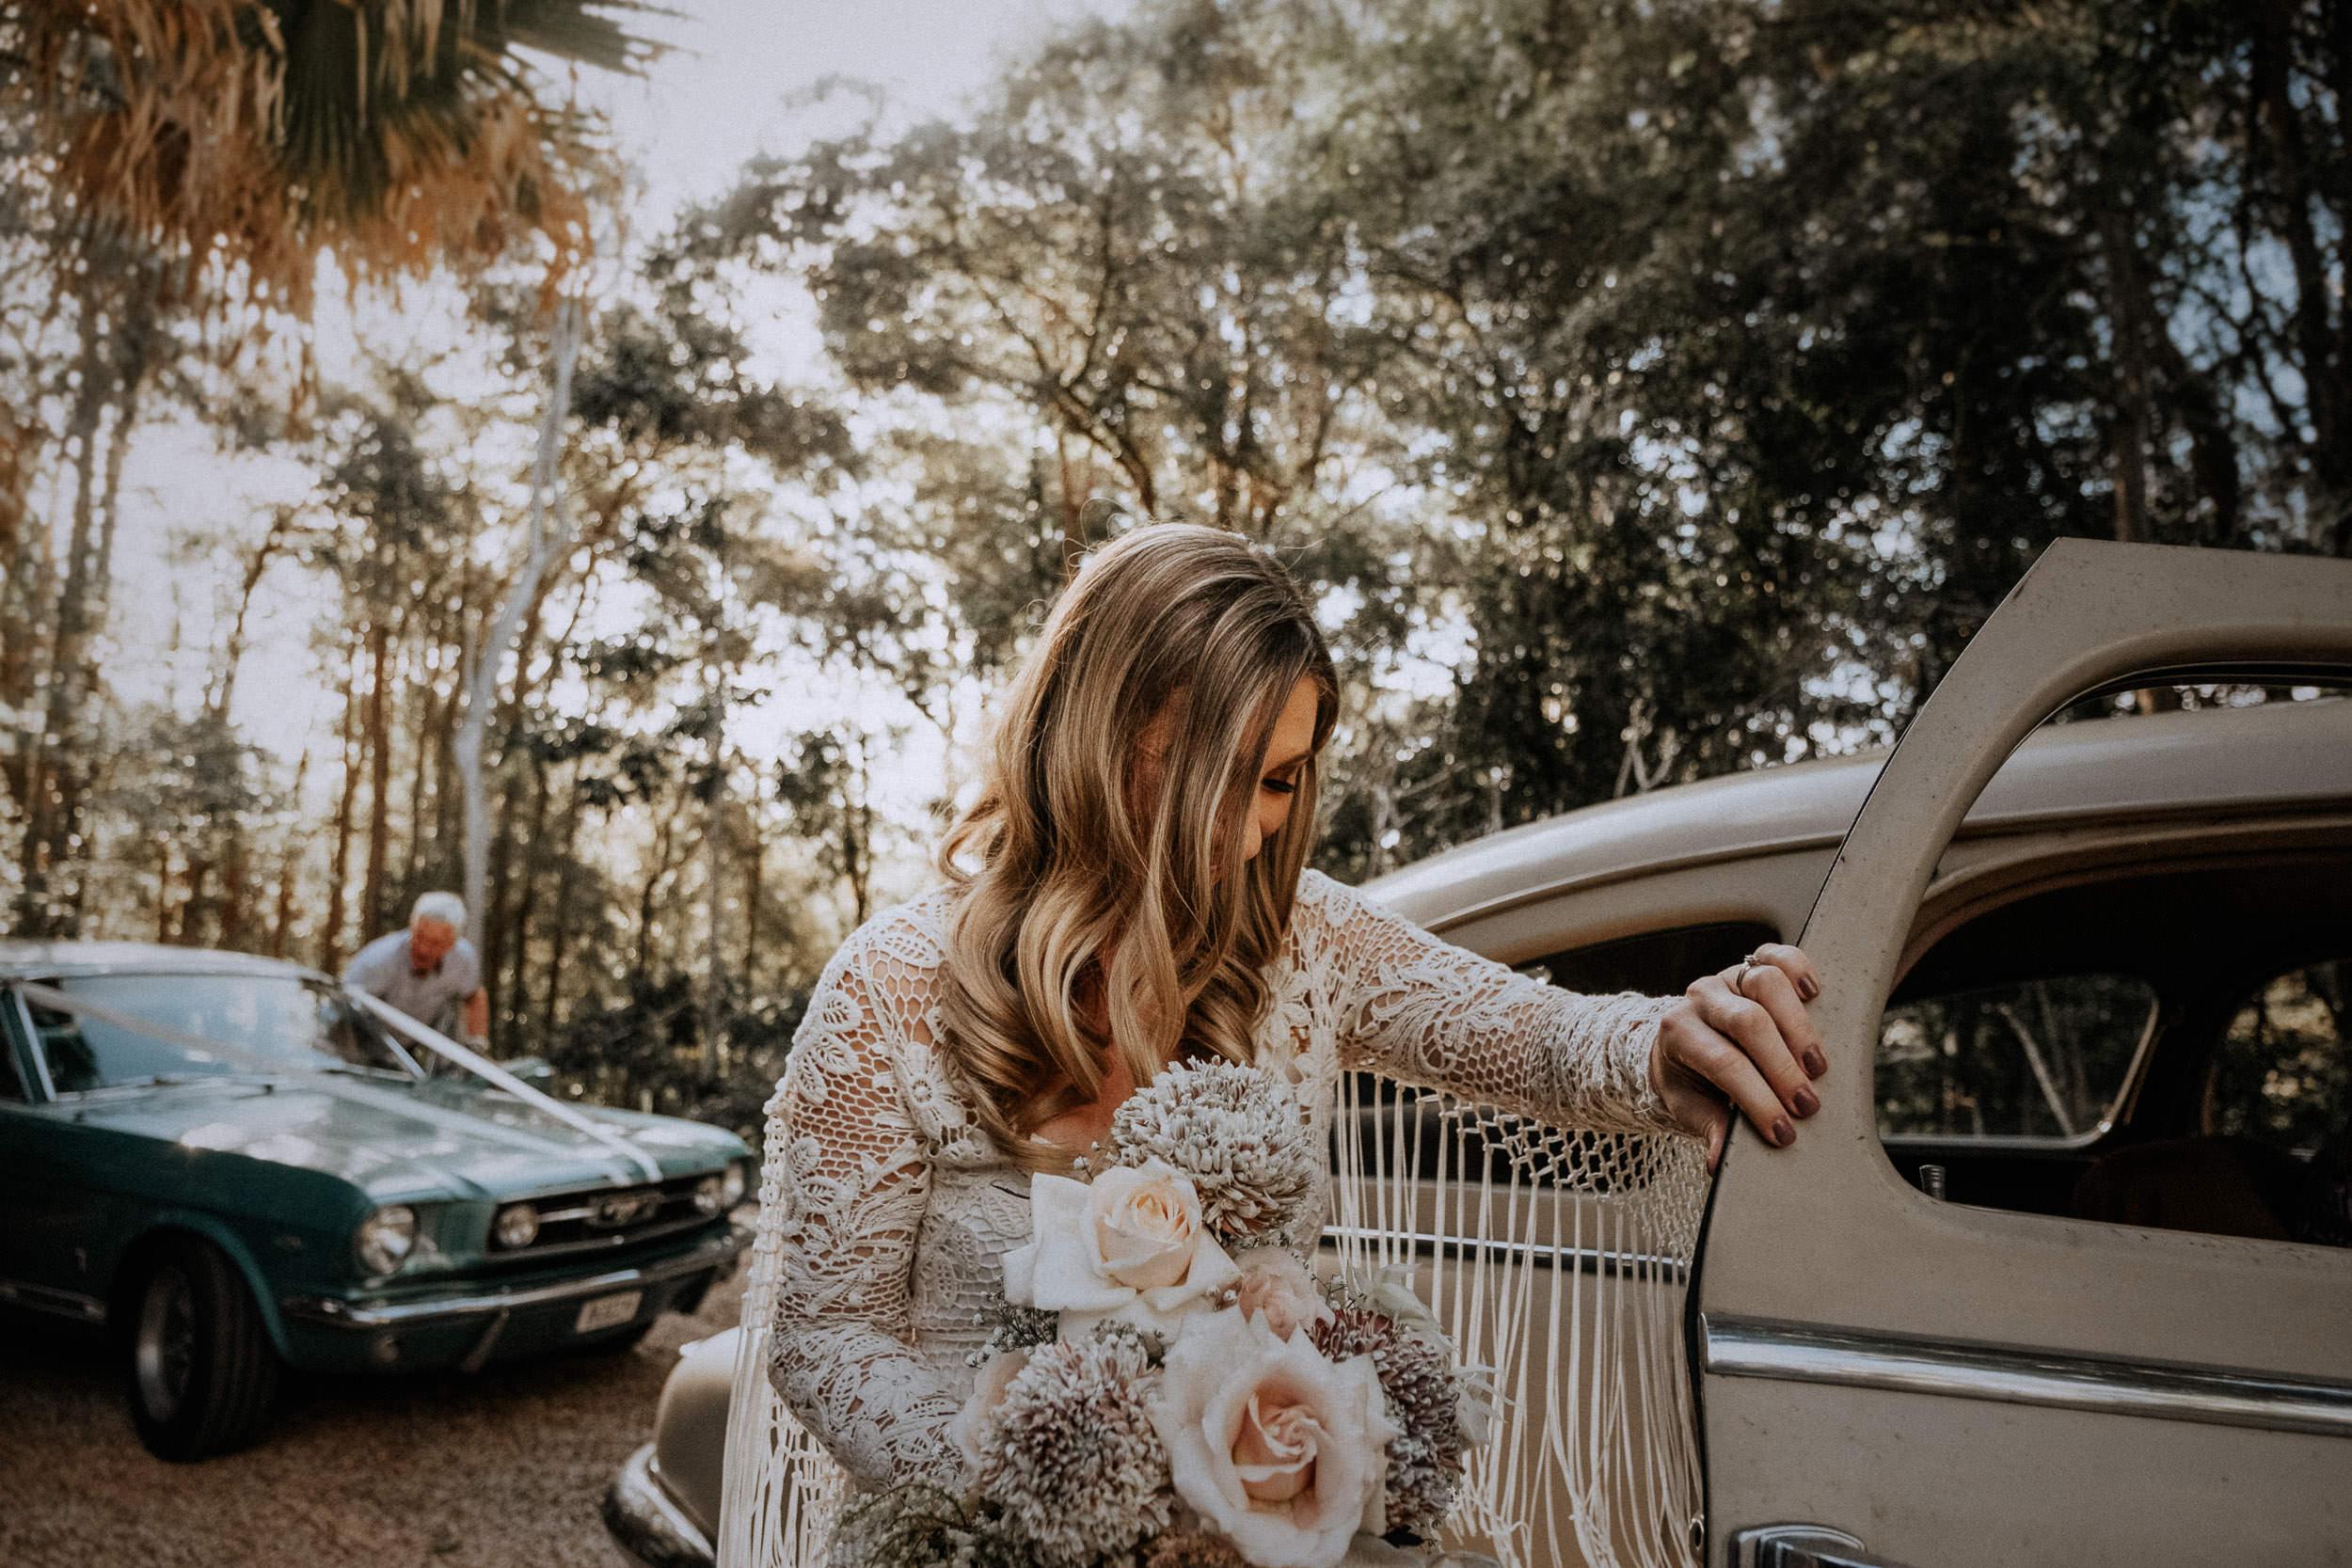 S&A Elopement - Kings & Thieves - Shred 'Til Dead - Central Coast Beach Forest Wedding - 148.jpg